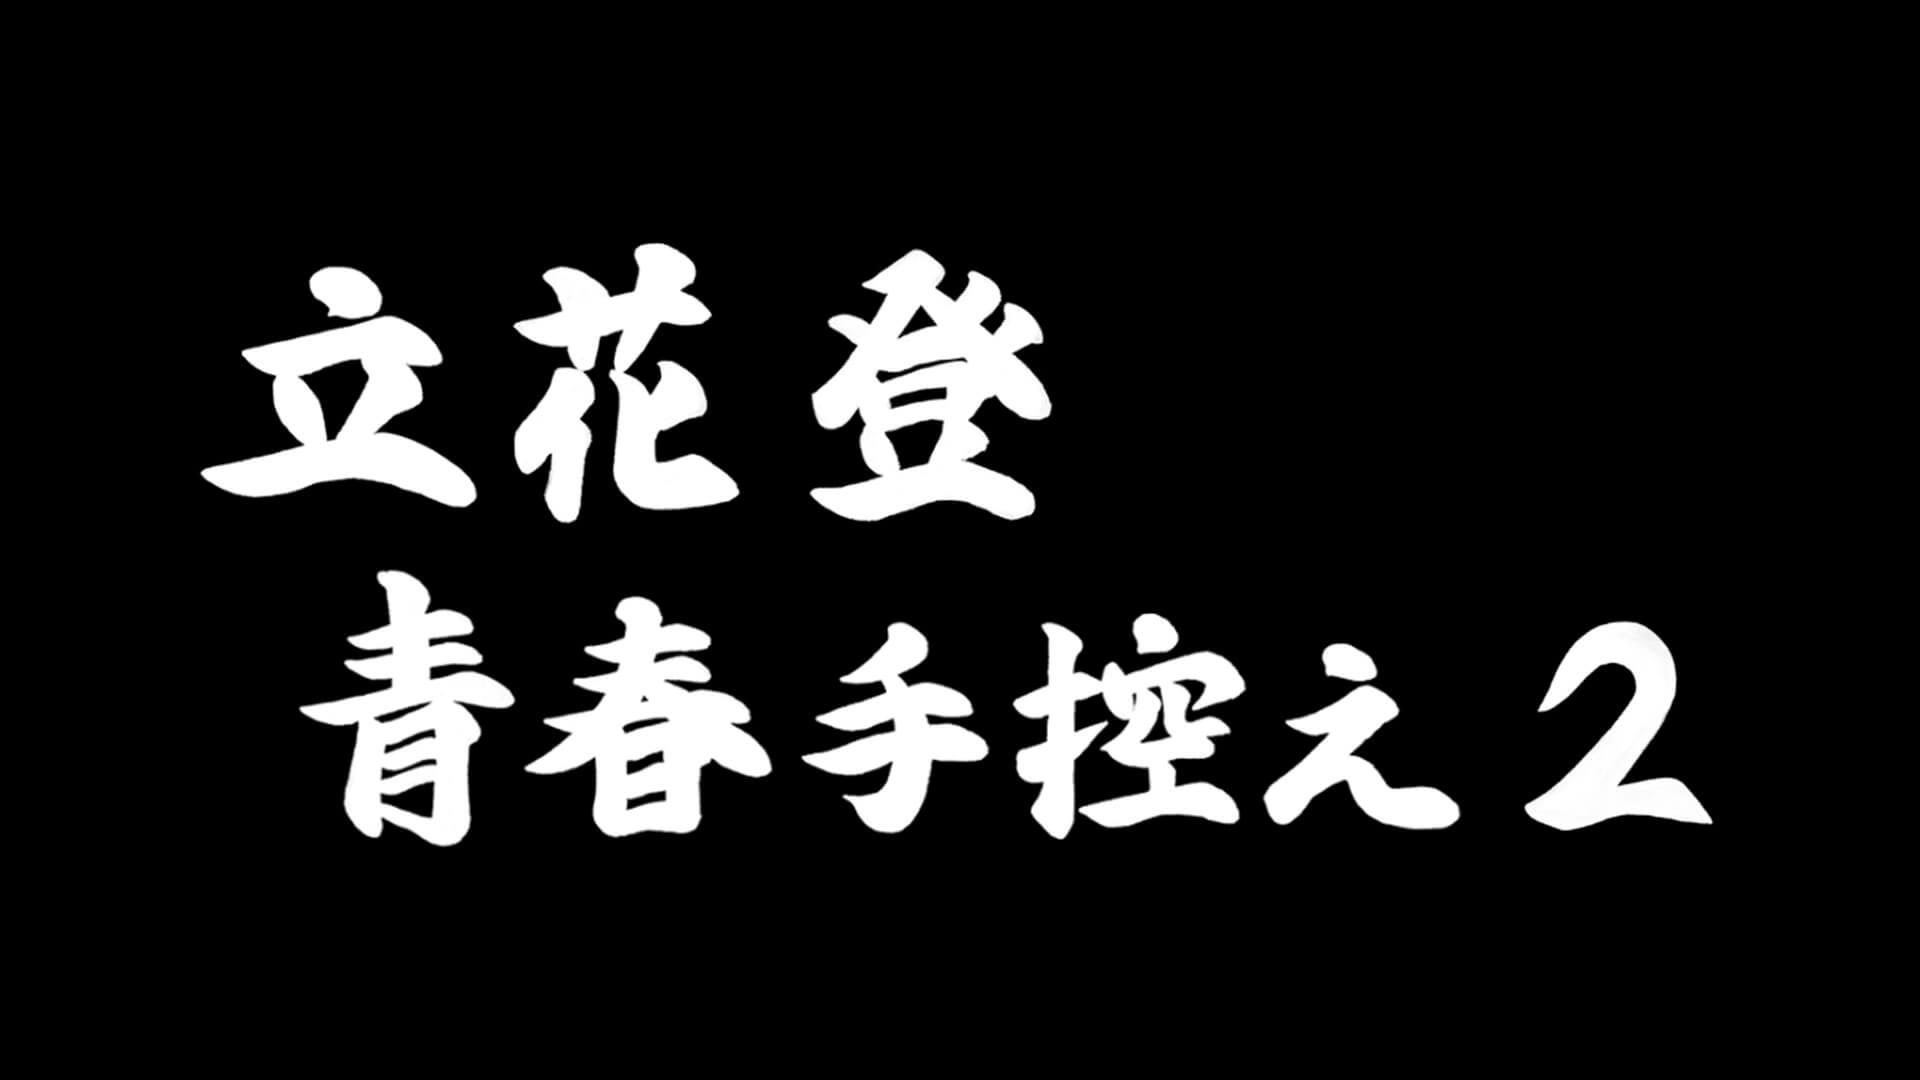 BS JIDAIGEKI 『TACHIBANA NOBORU SEISHUN TEHIKAE 2』